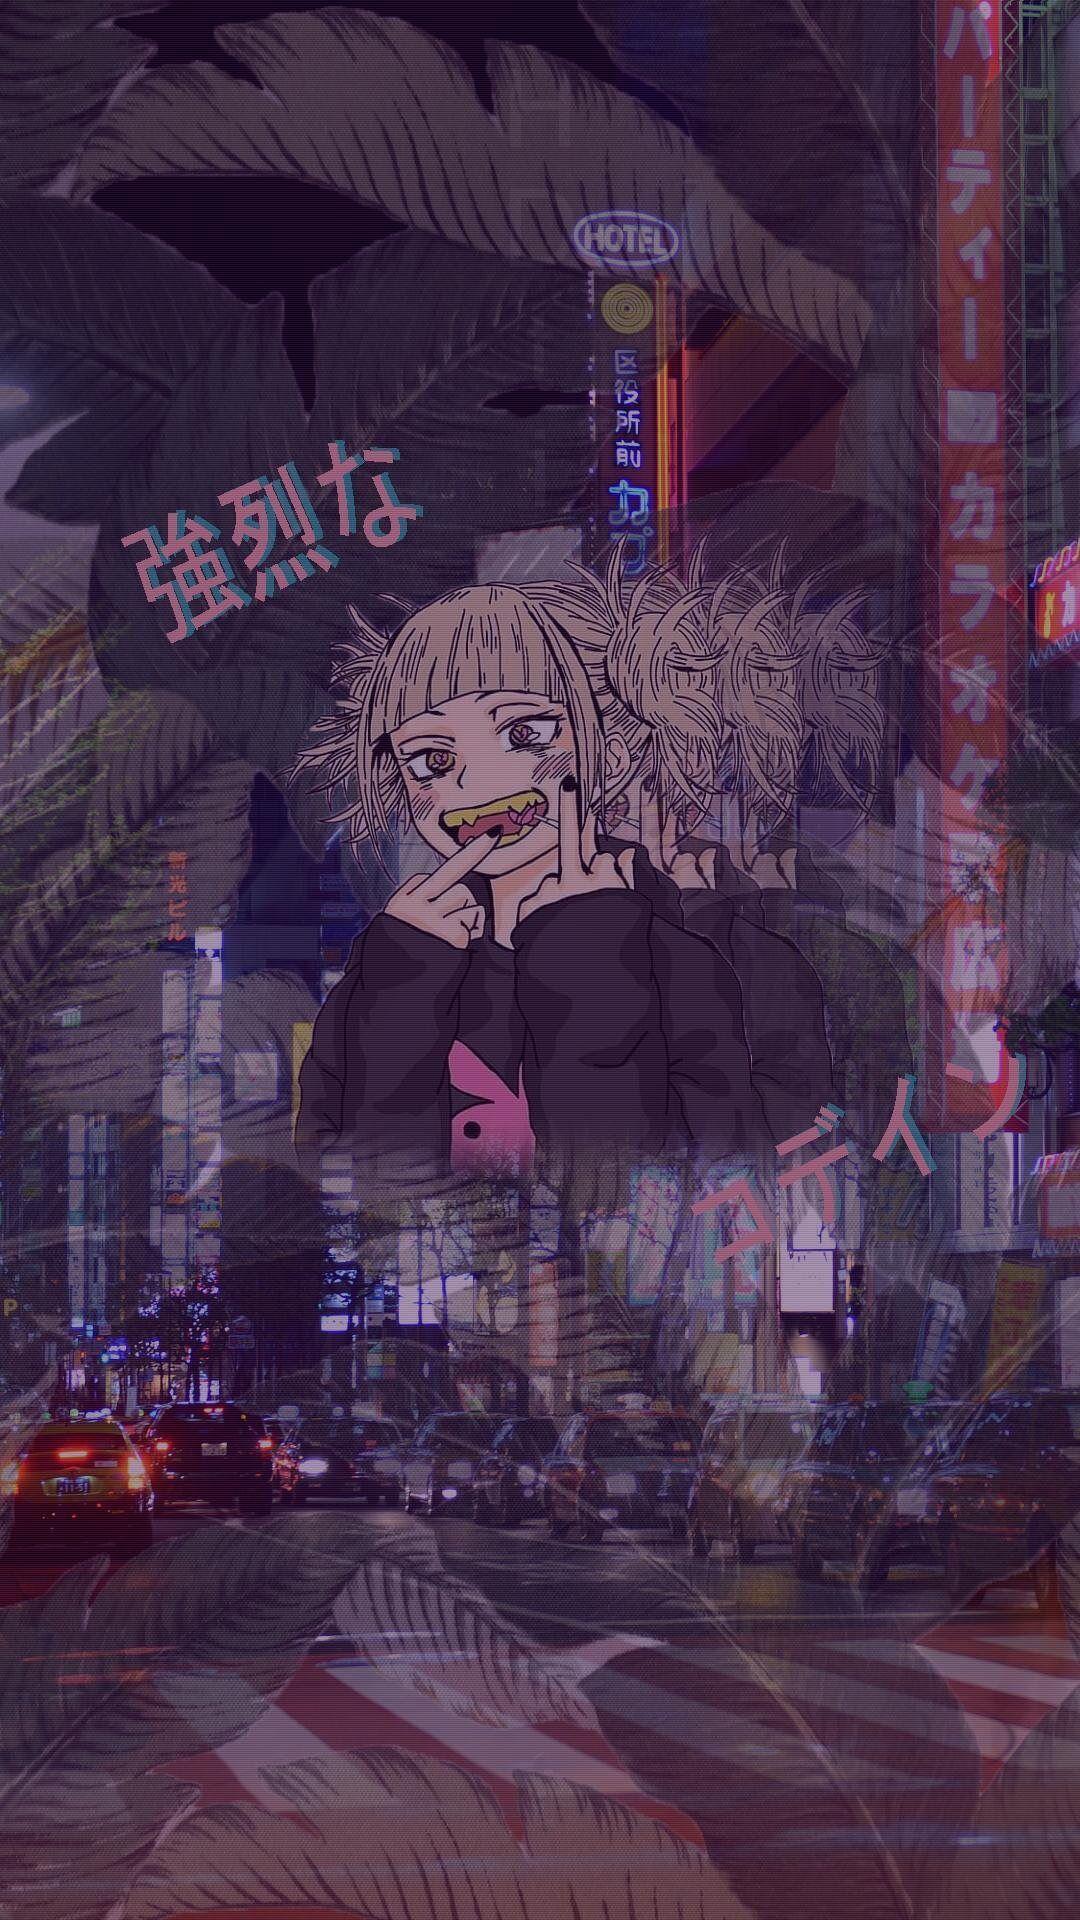 Anime Dark Pastel Wallpapers Wallpaper Cave